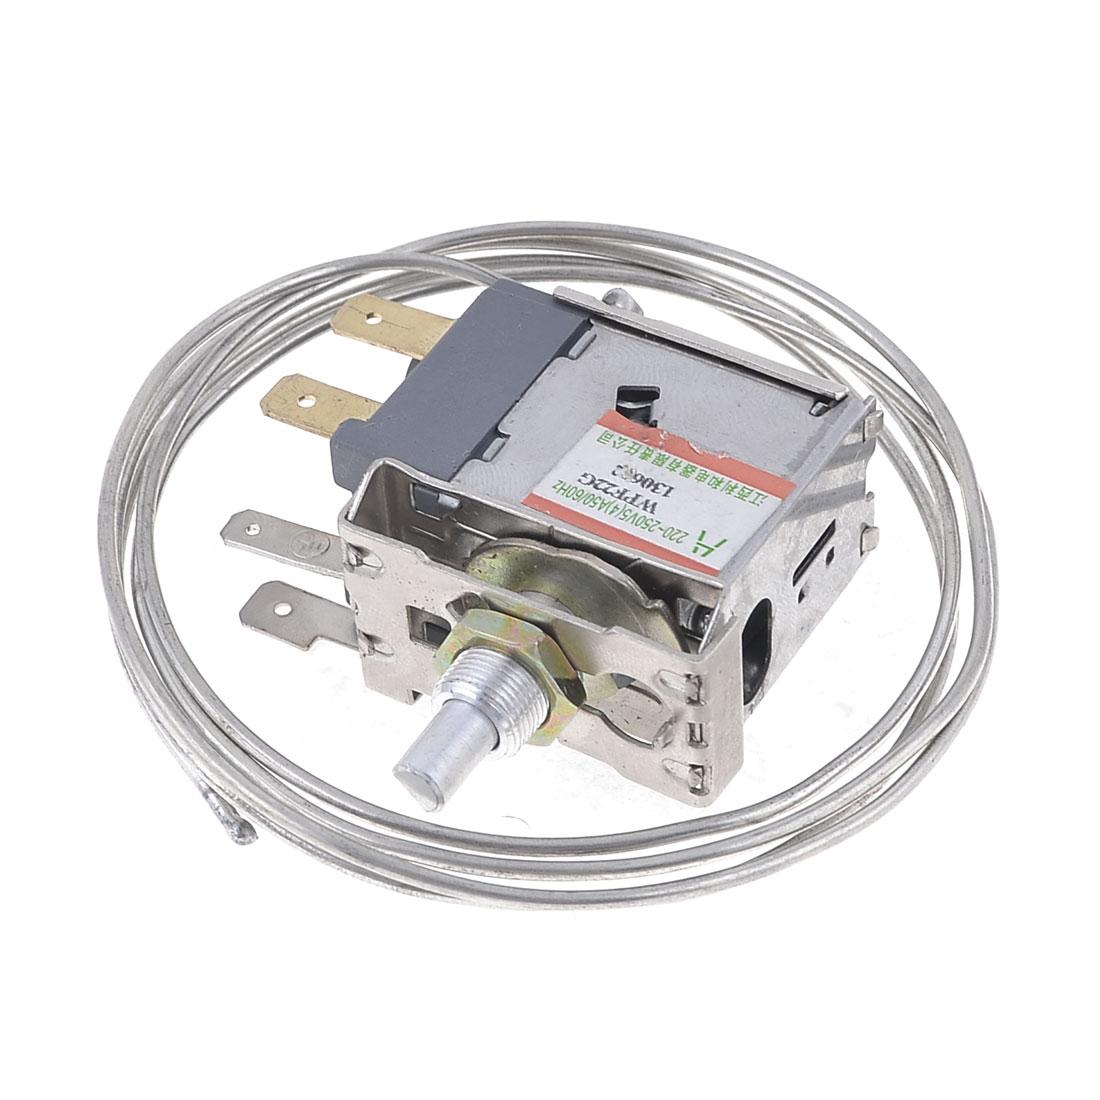 AC 220-250V 5/4A Refrigeration Thermostat for Refrigerators